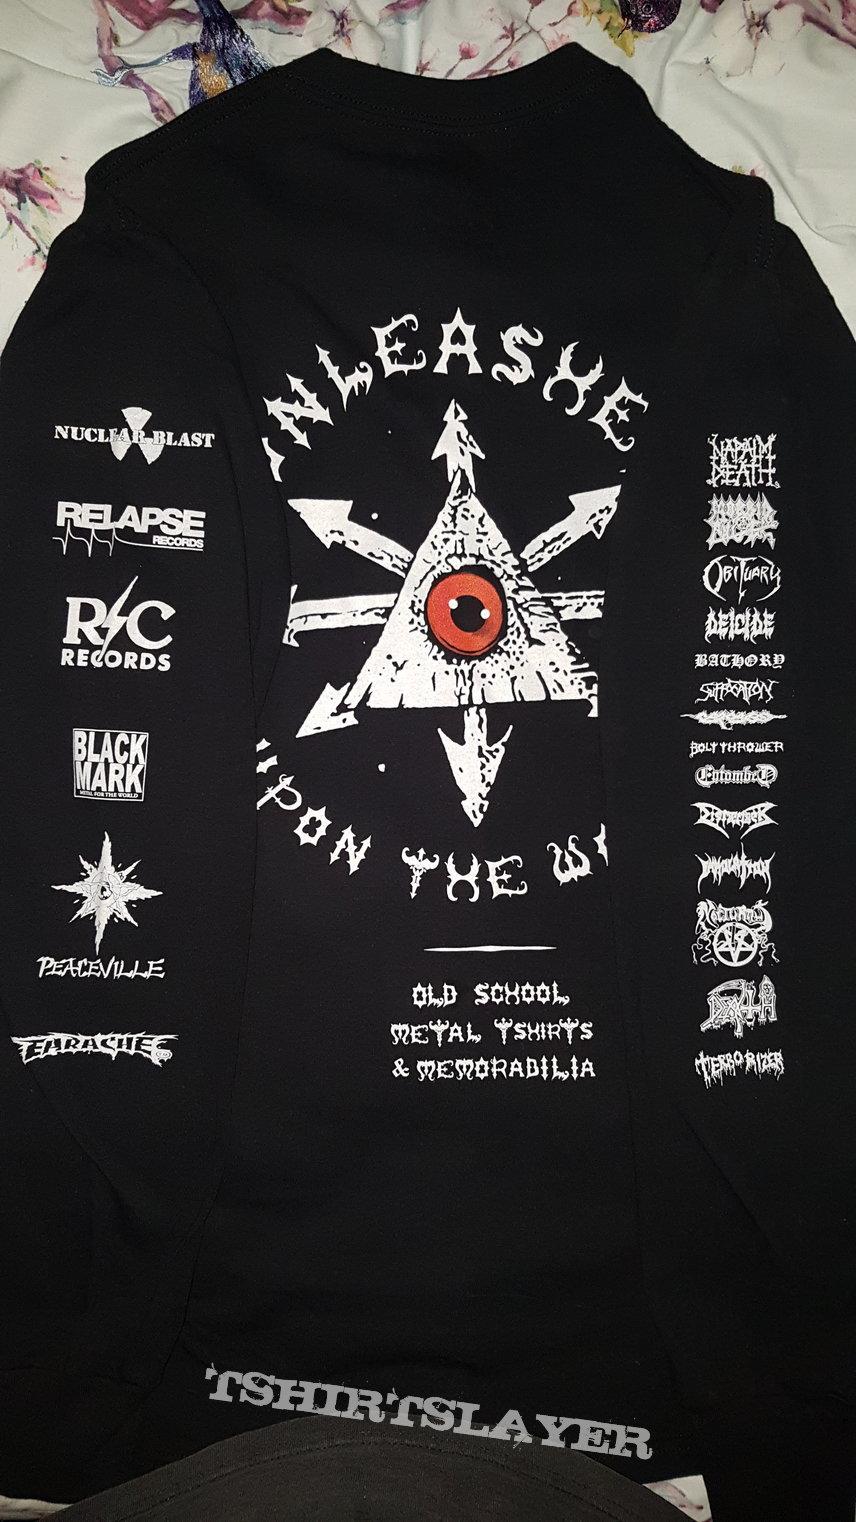 Old School Metal and Memorabilia tribute longsleeve